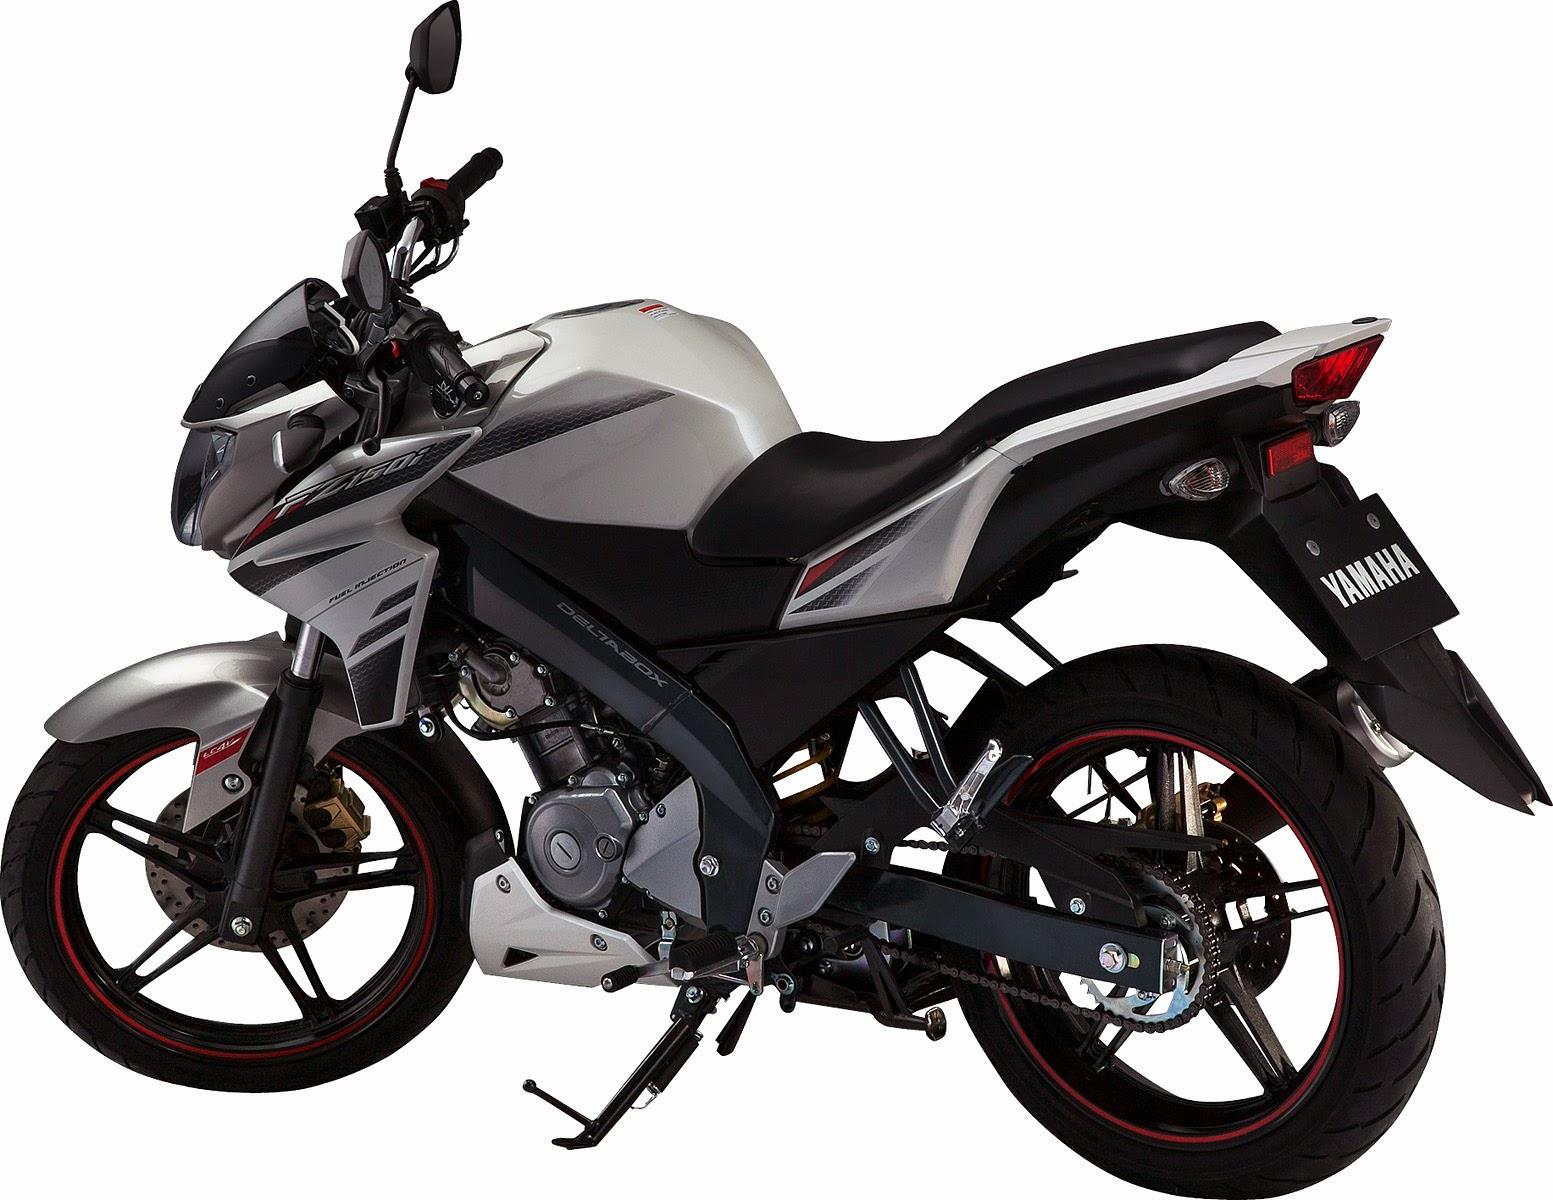 Harga Kredit dan Cicilan Motor Yamaha New Vixion Terbaru